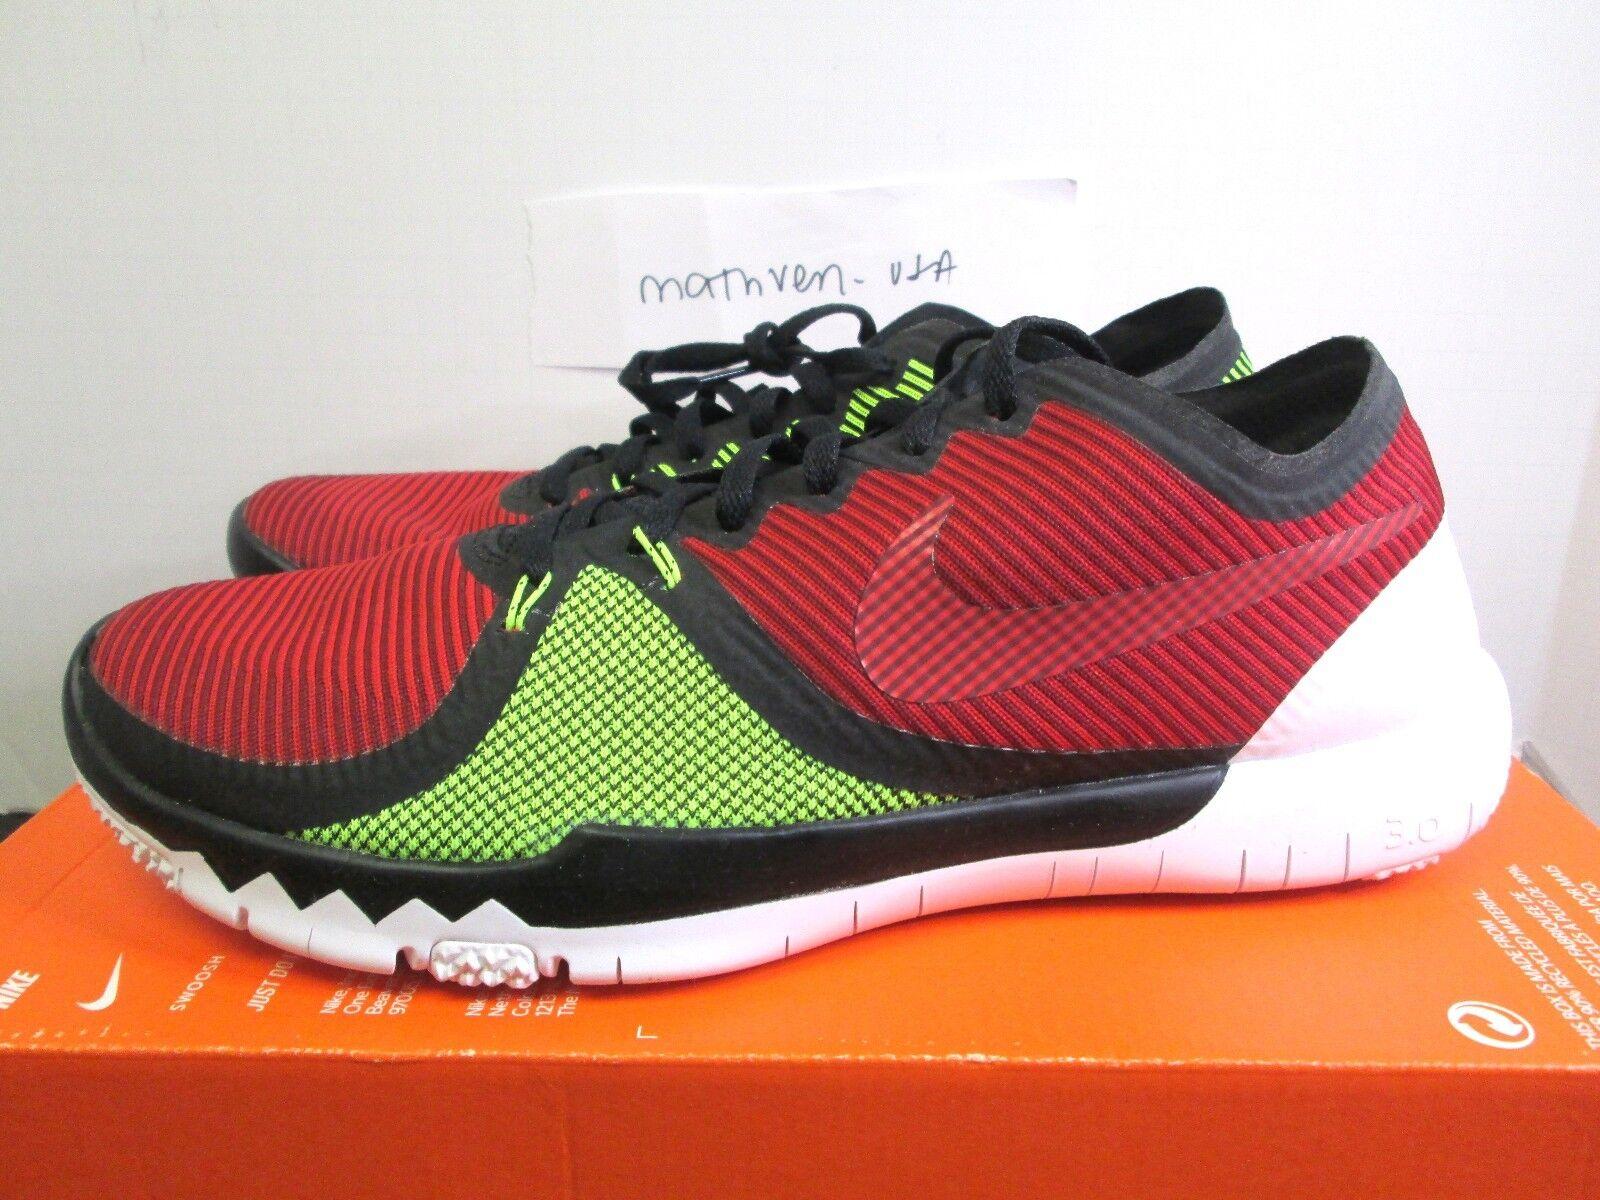 Nike Free Trainer 3.0 V4 men athletic shoes Red green black 749361 066 sz 11